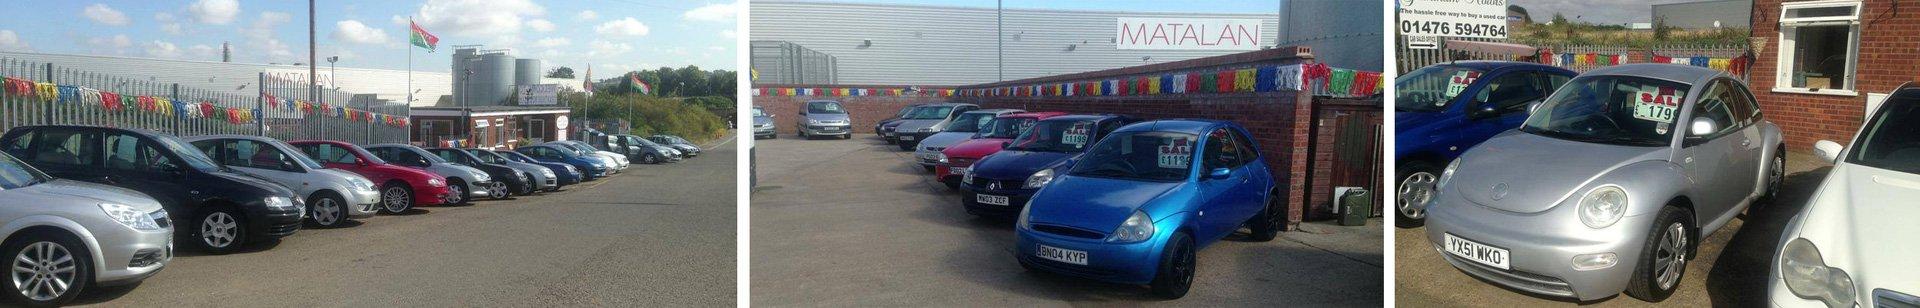 Range of cars for sale